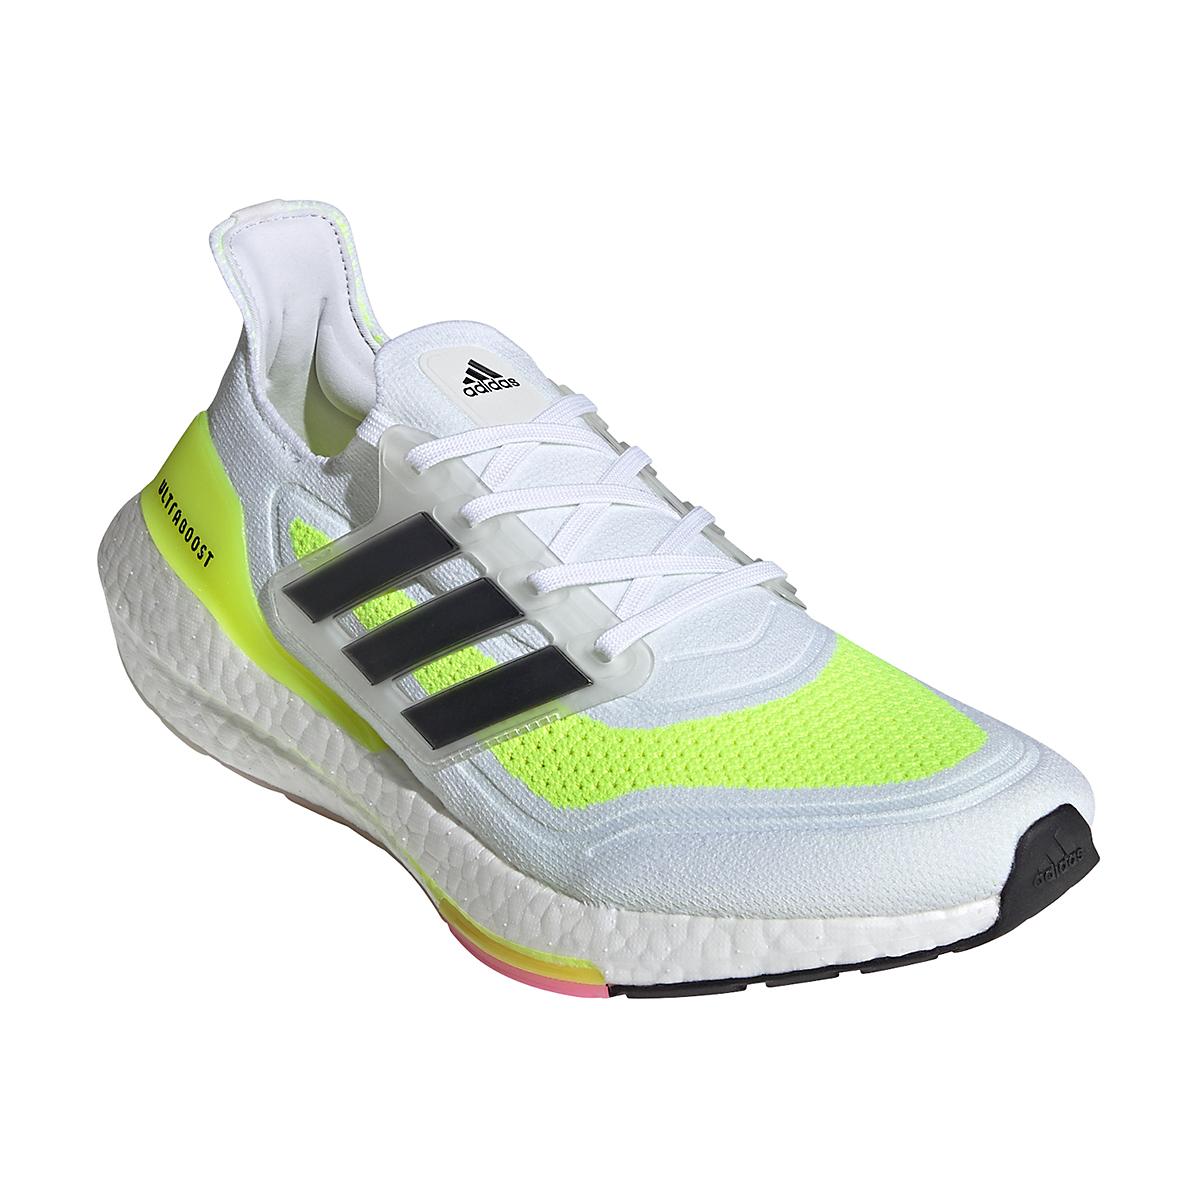 Men's Adidas Ultraboost 21 Running Shoe - Color: Cloud White/Black/Solar Yellow - Size: 5 - Width: Regular, Cloud White/Black/Solar Yellow, large, image 2